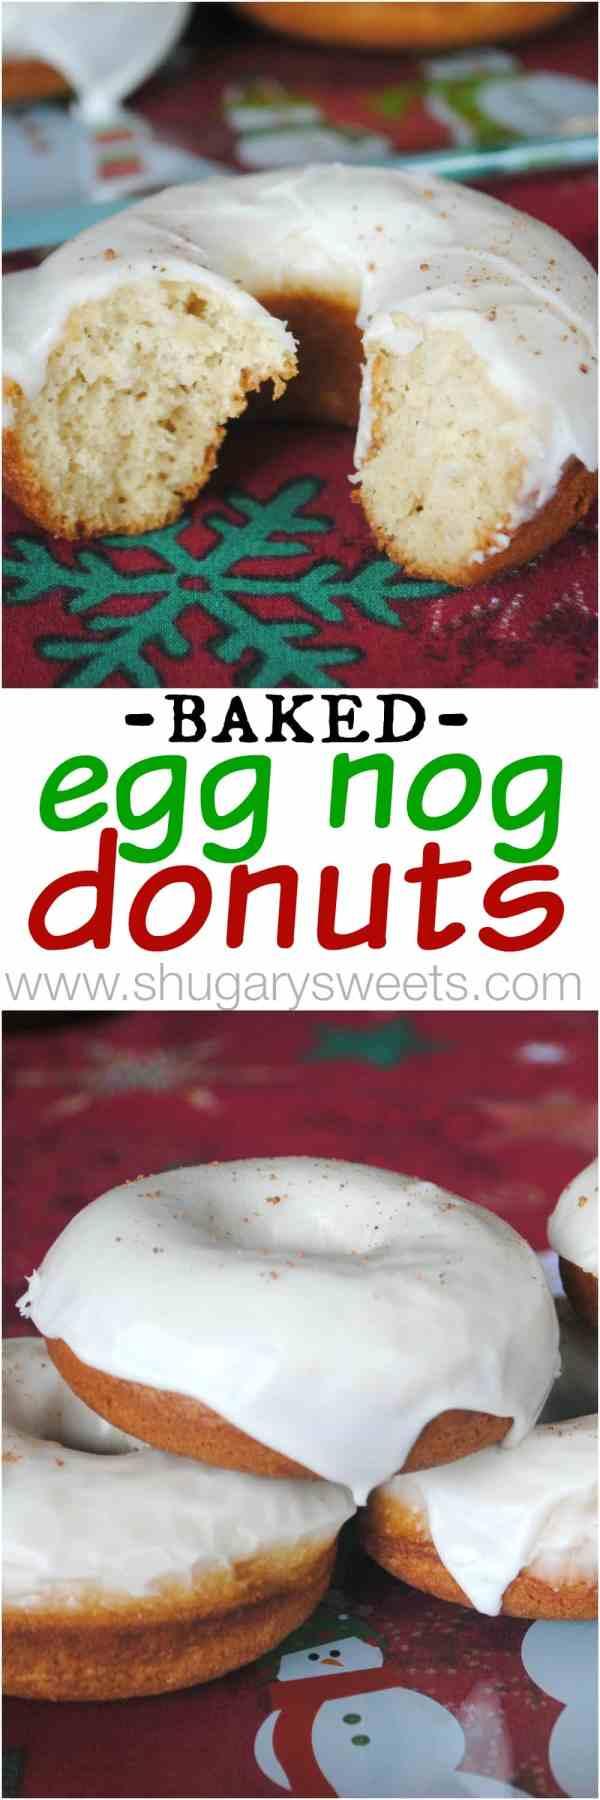 Eggnog Donuts Baked - Shugary Sweets